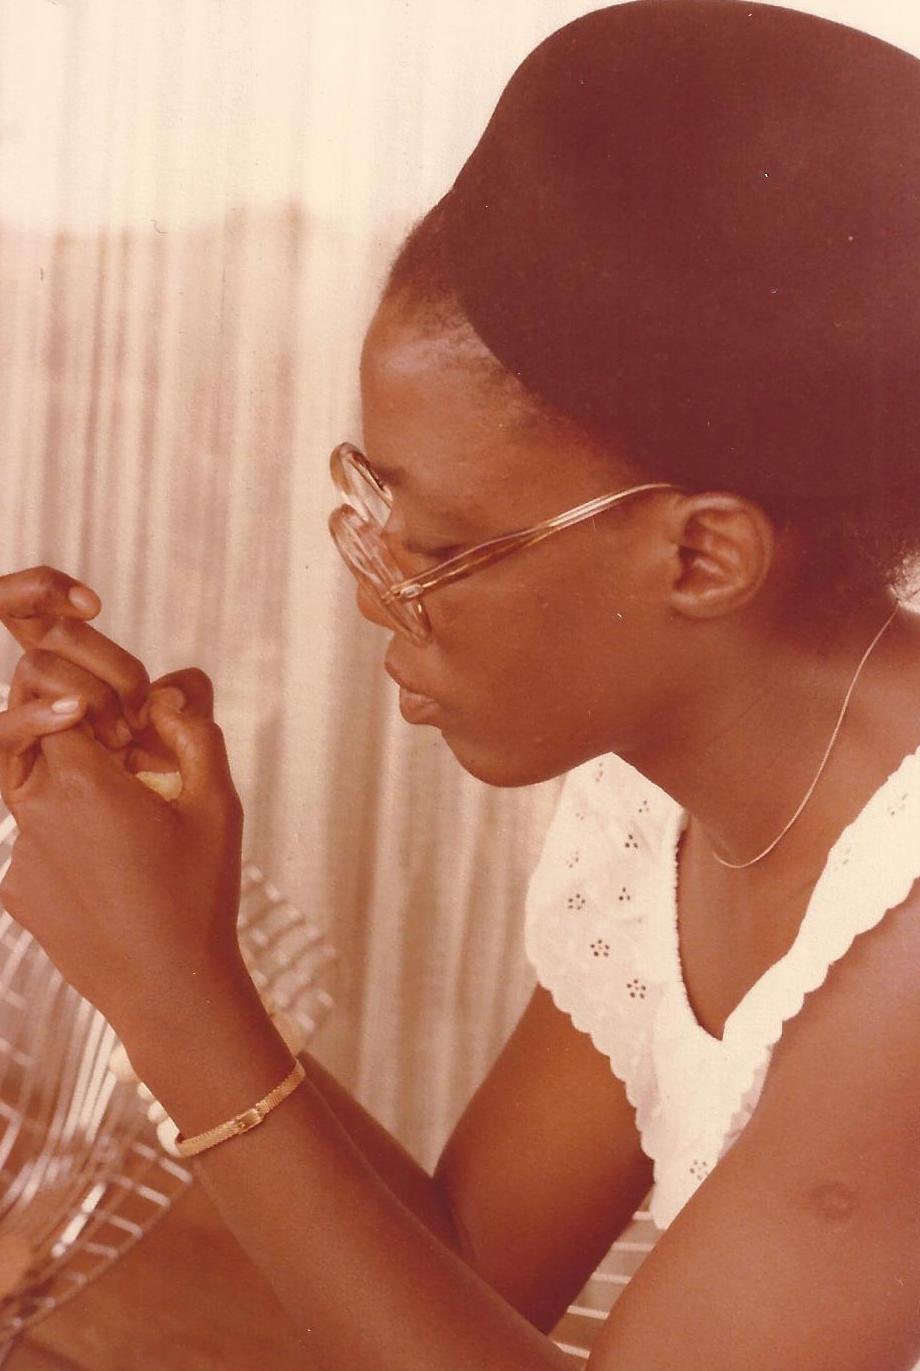 LUCY BANDA SICHONE (Zambia & somerville 1978)